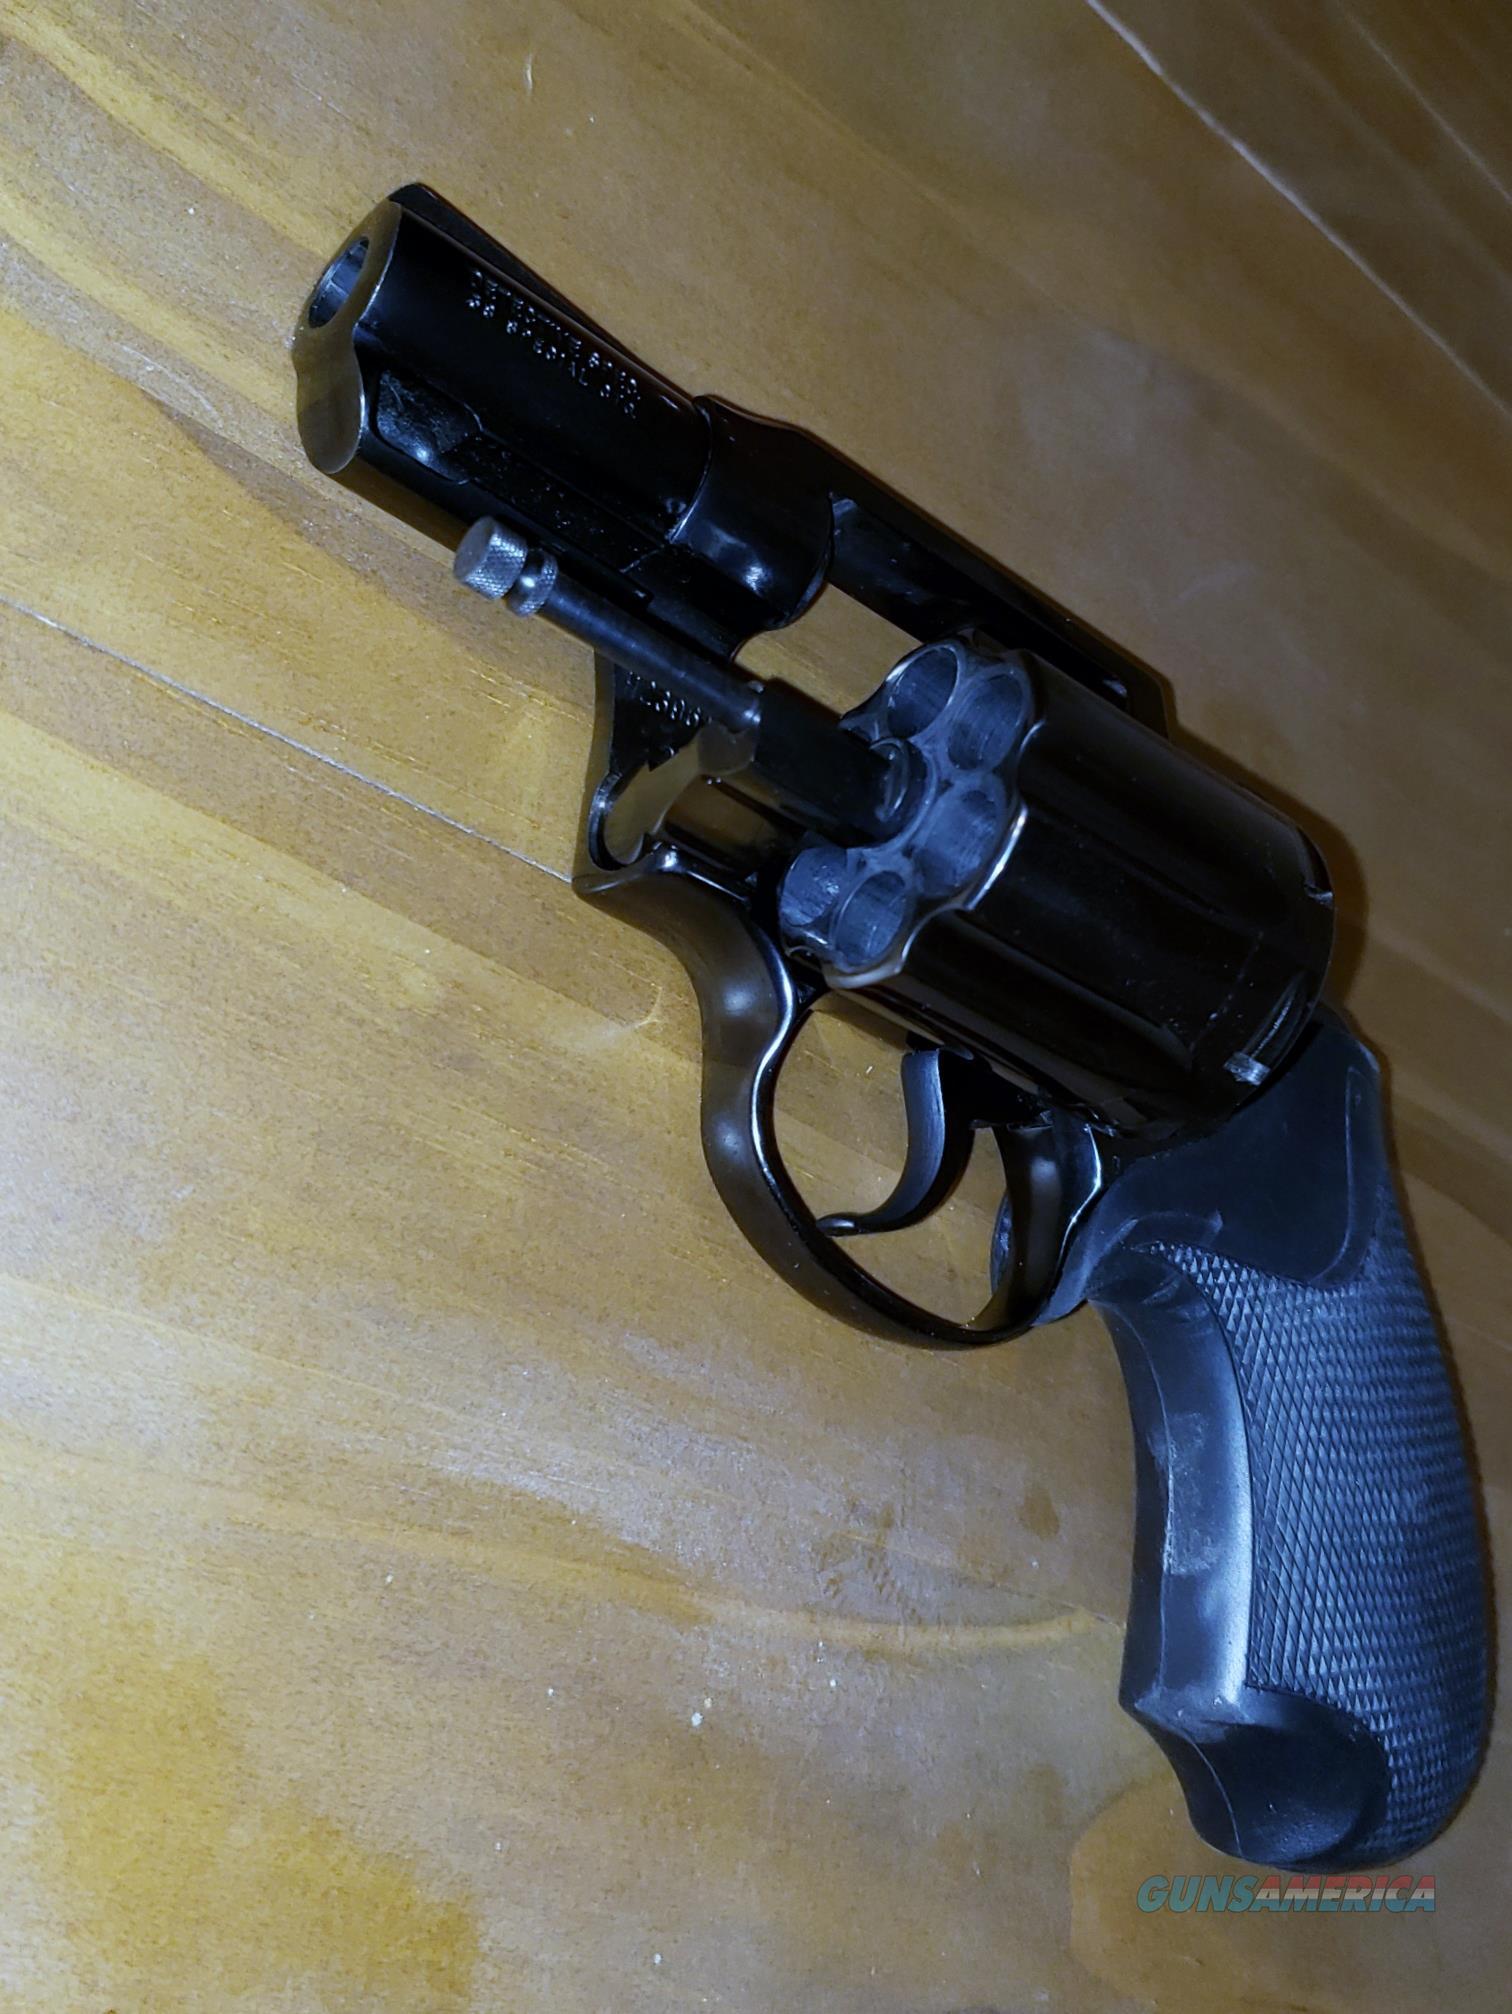 ColtH23961Detective Special.38  Guns > Pistols > Colt Single Action Revolvers - 3rd Gen.